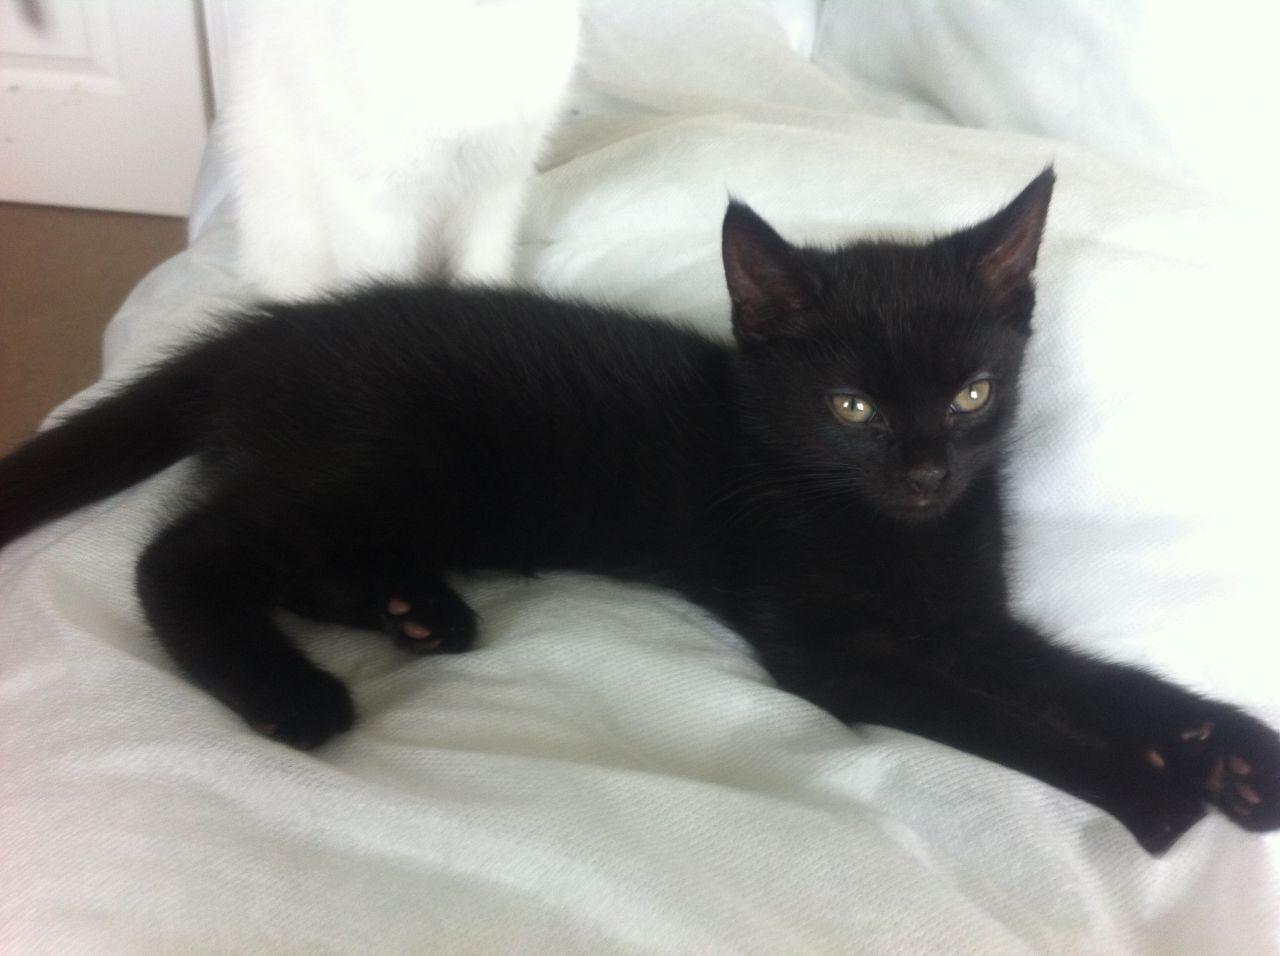 Gorgeous Purebred British Shorthair Kittens British Shorthair Kittens Cats Kittens Kittens